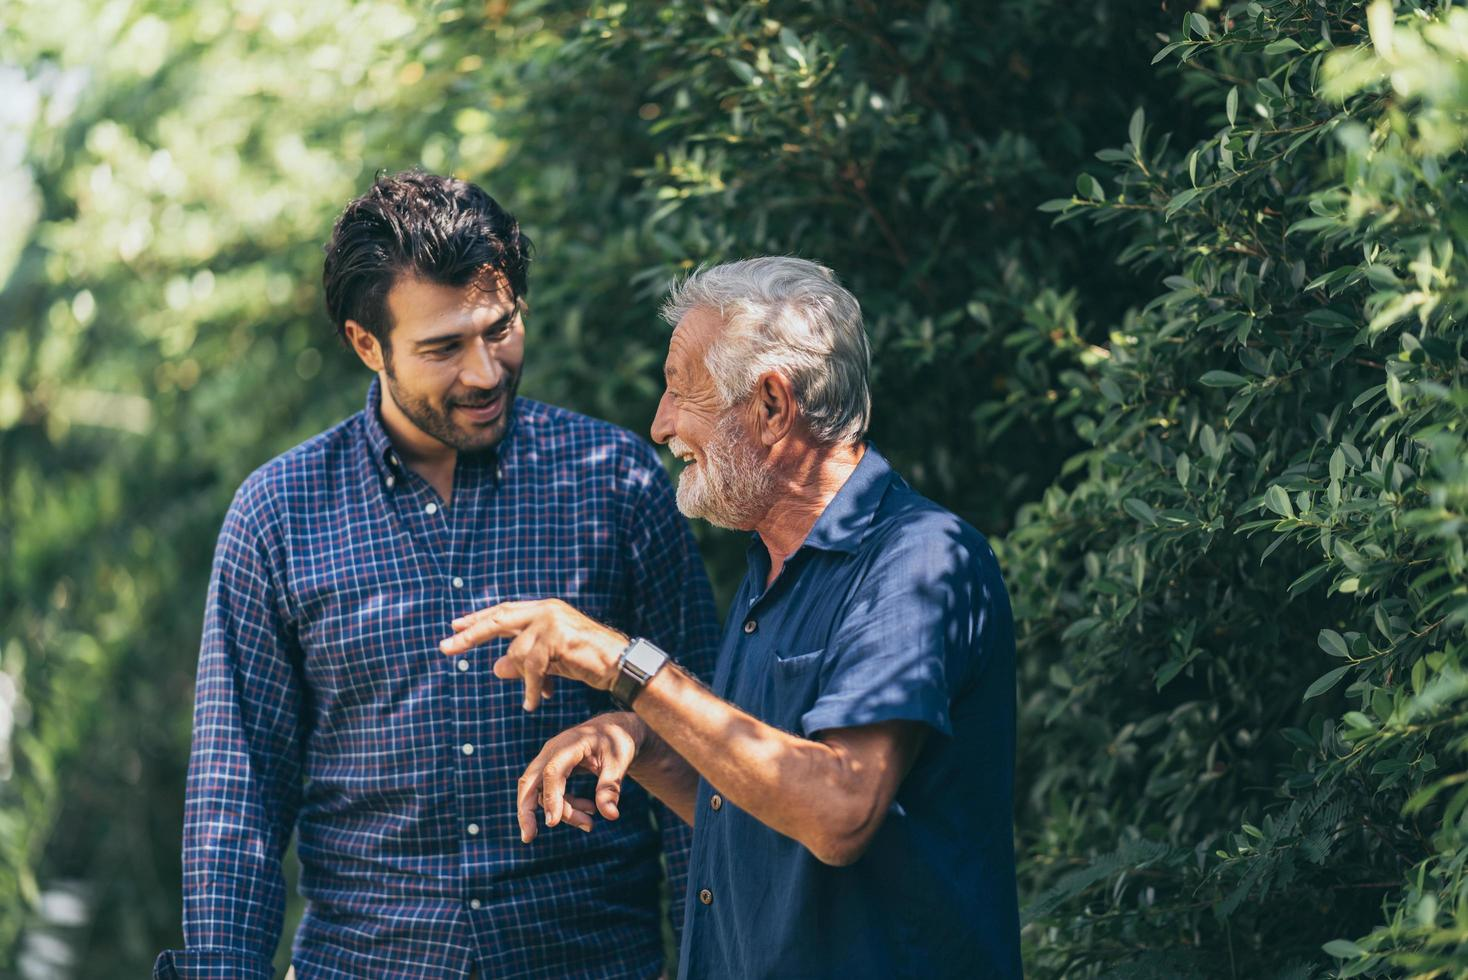 velho pai e filho adulto relaxar no quintal foto